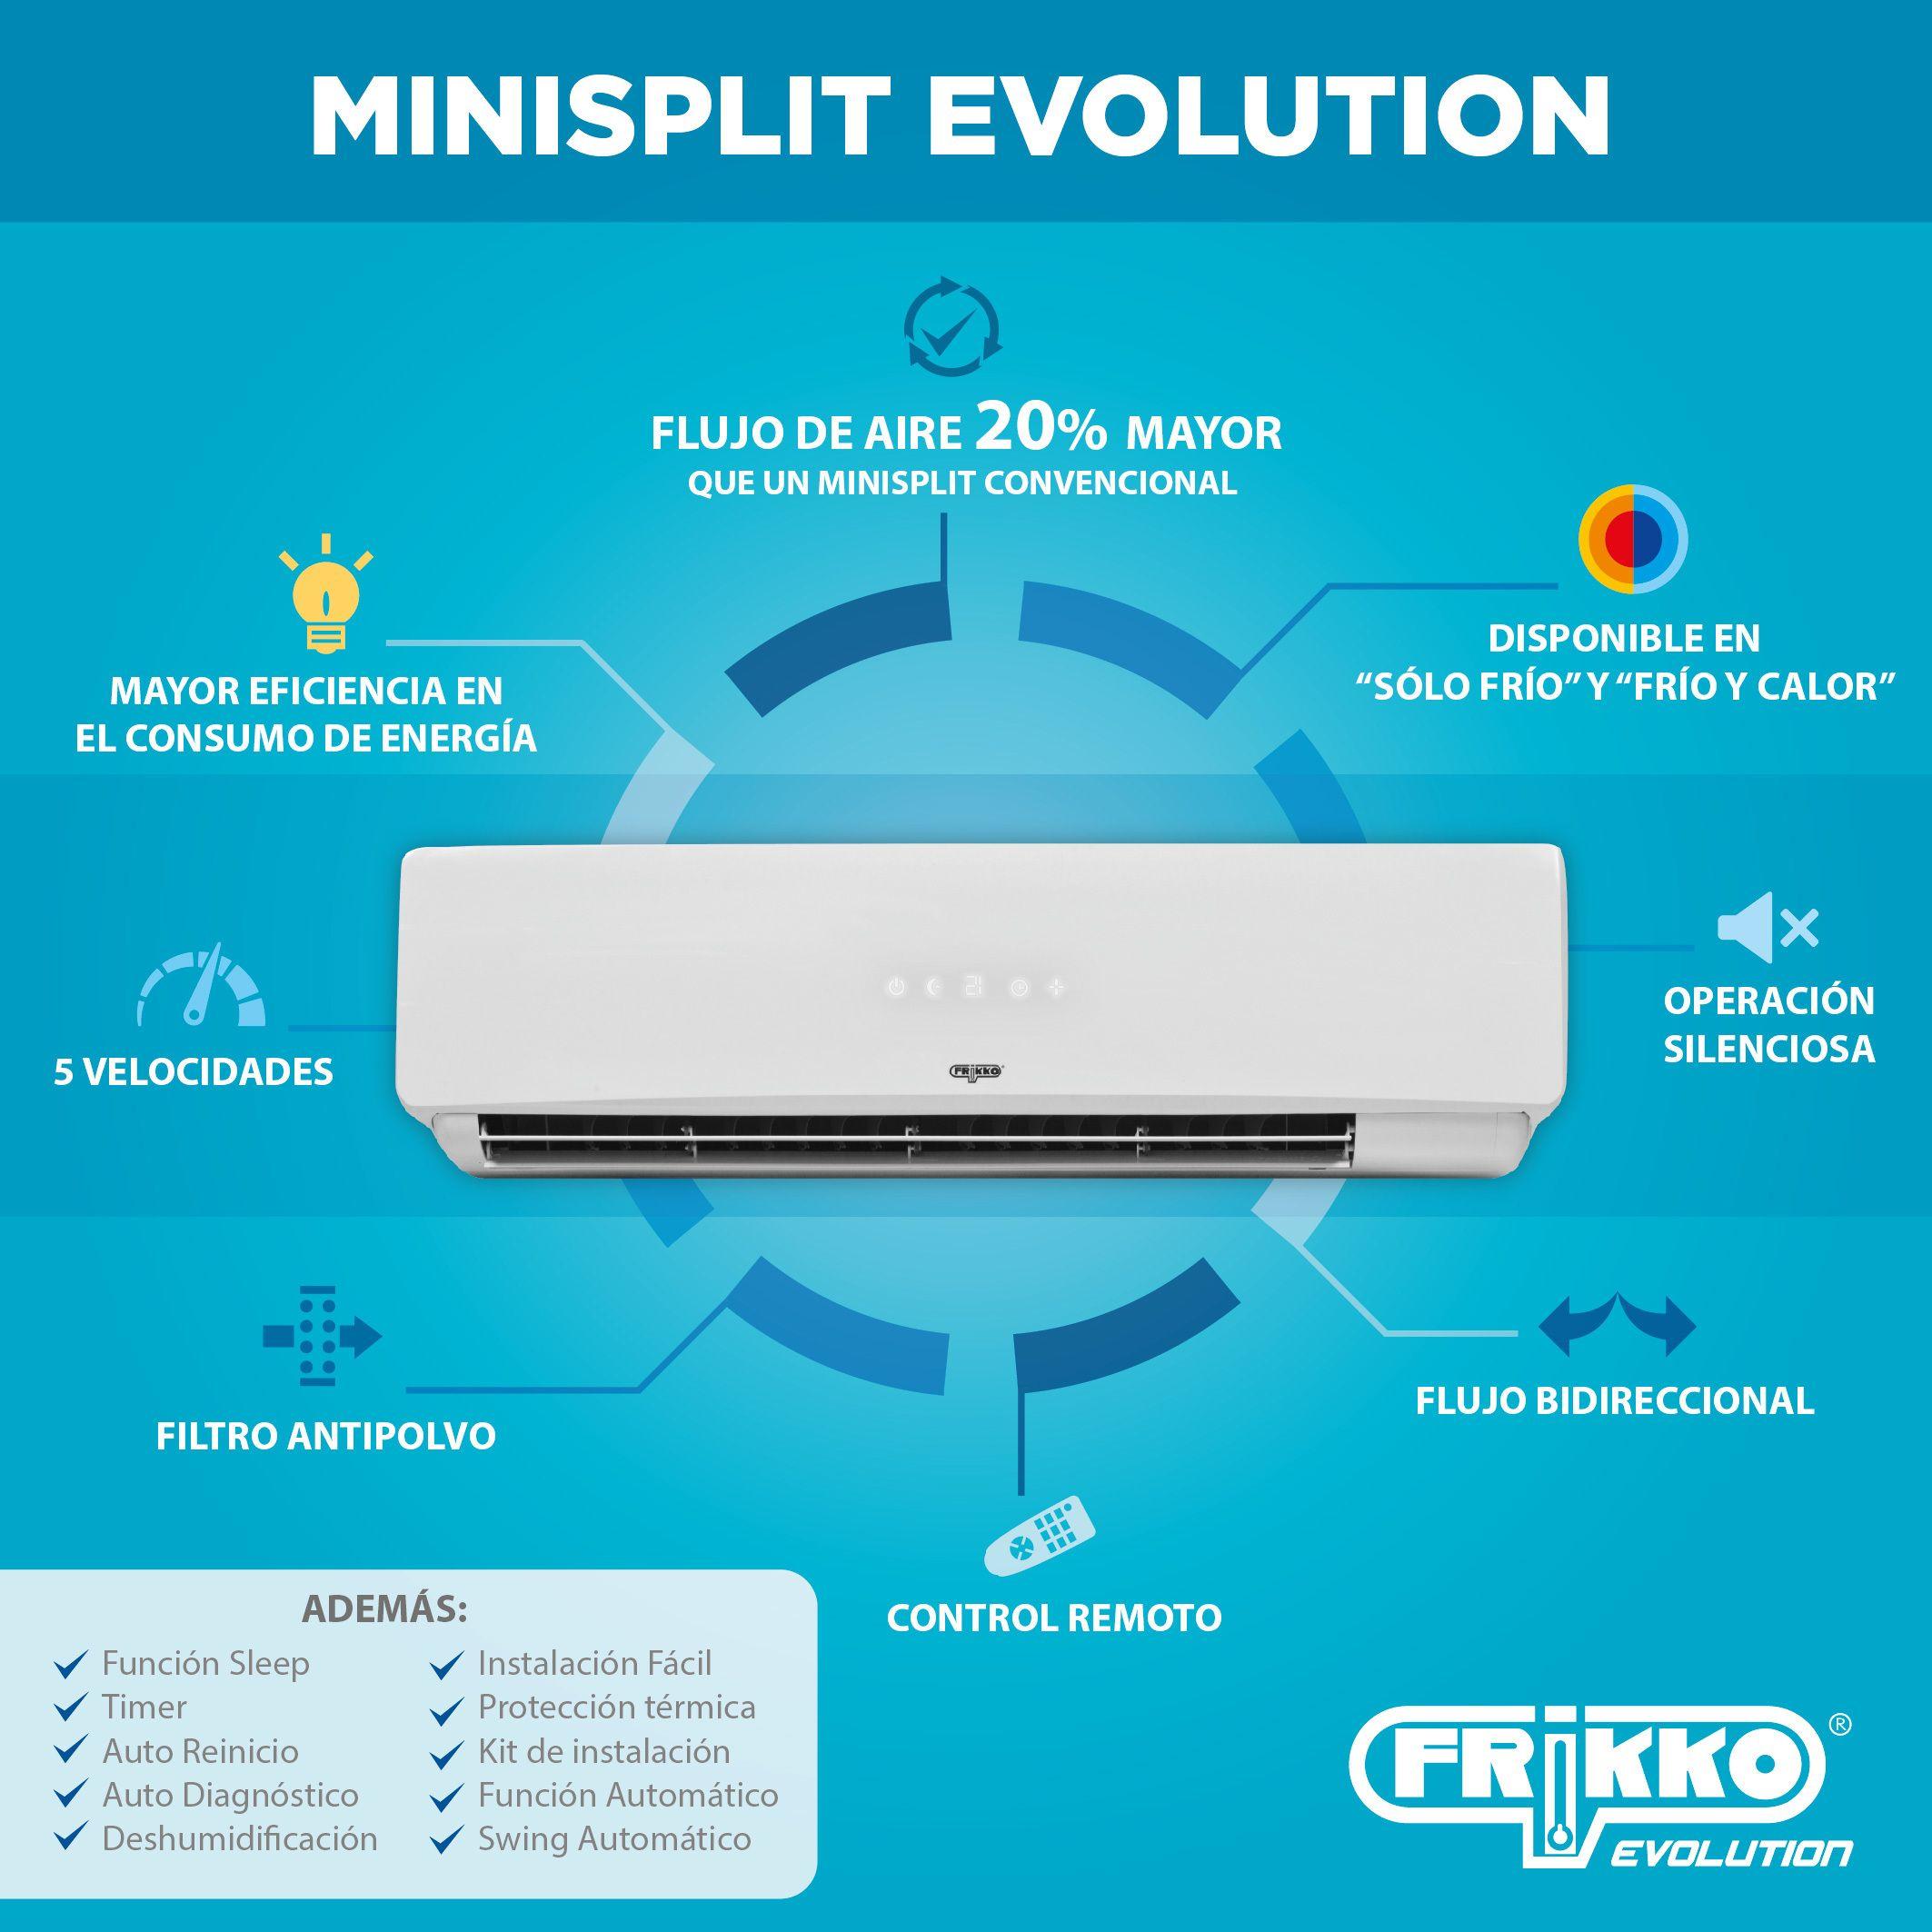 ¡Conoce el minisplit Evolution de Frikko! Control remoto